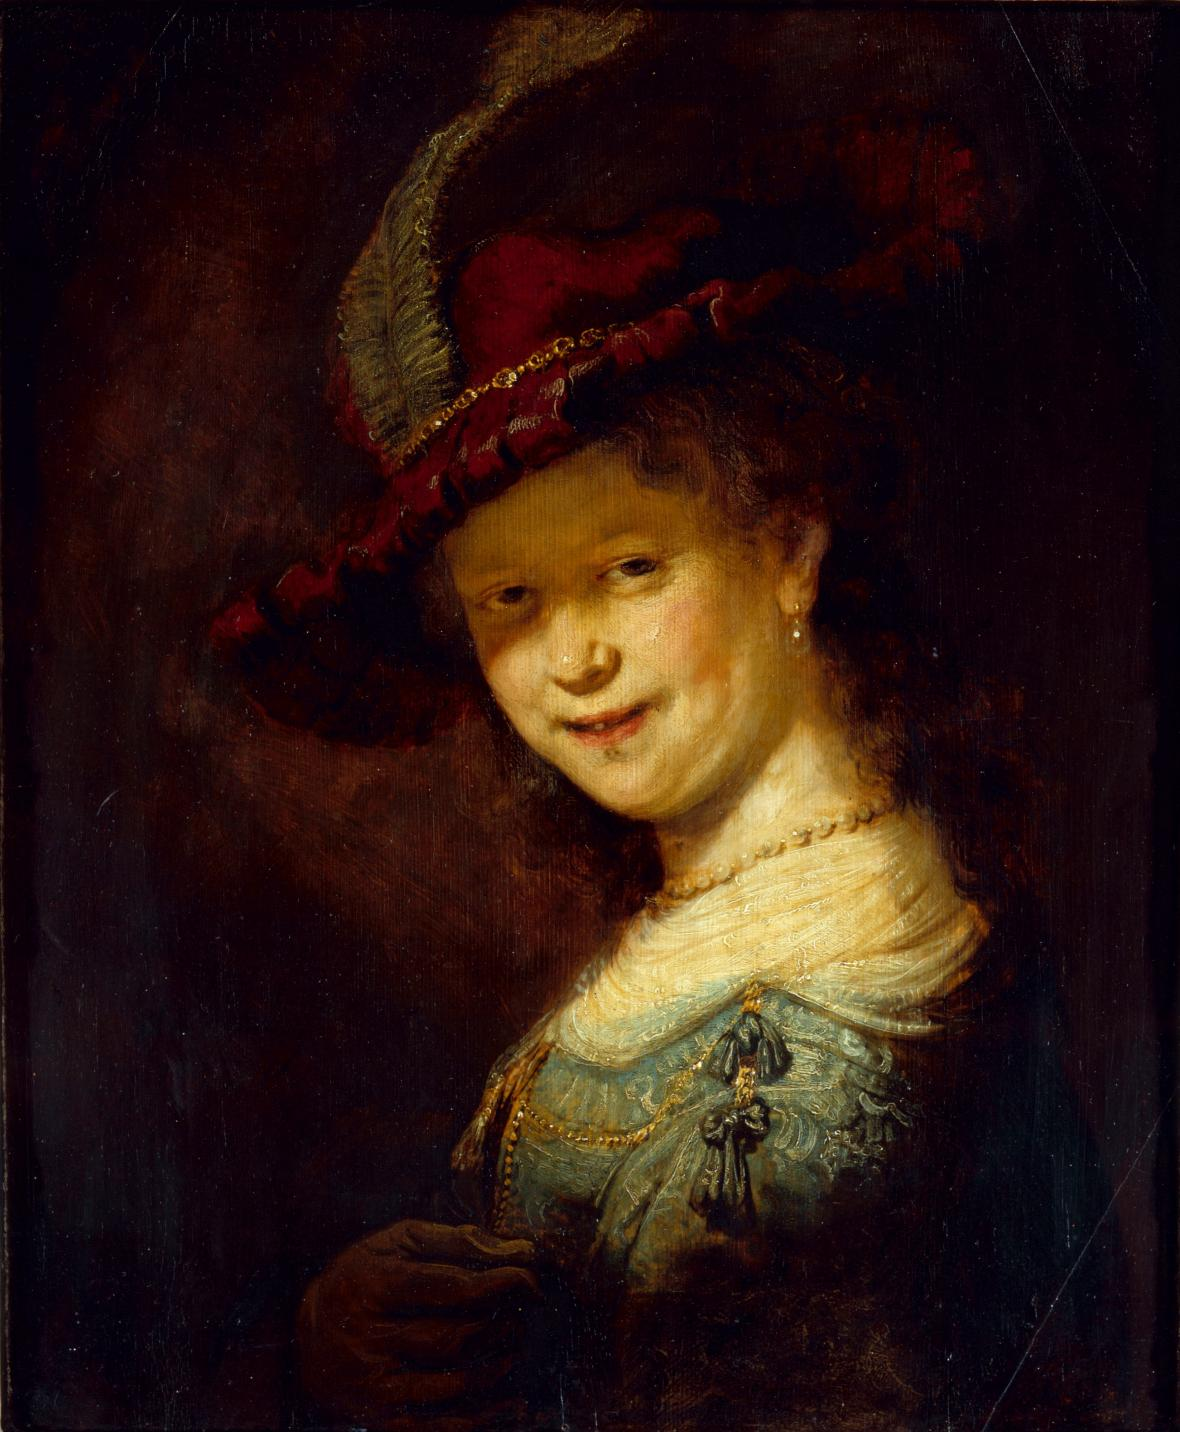 Rembrandt / Saskia Uylenburghová jako dívka, 1633